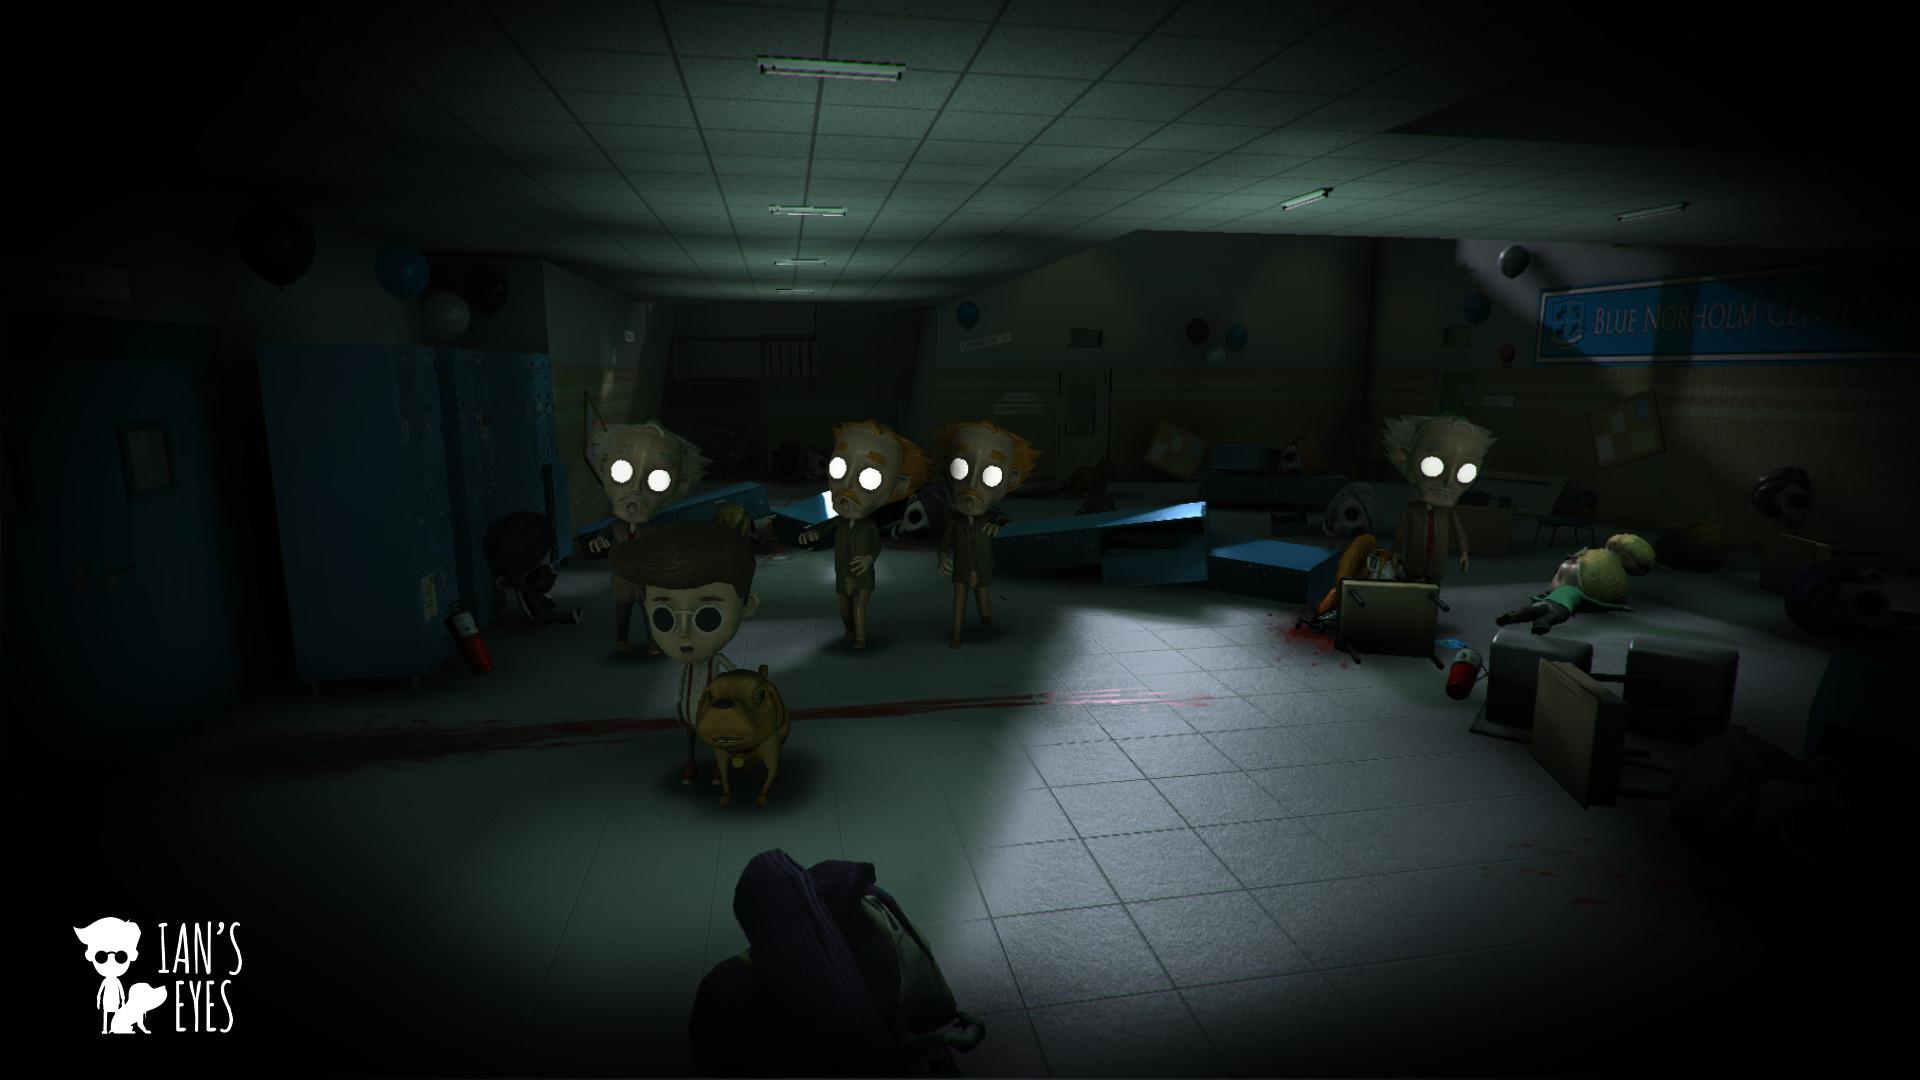 Халява: в Steam даром отдают инди-хоррор Ian's Eyes